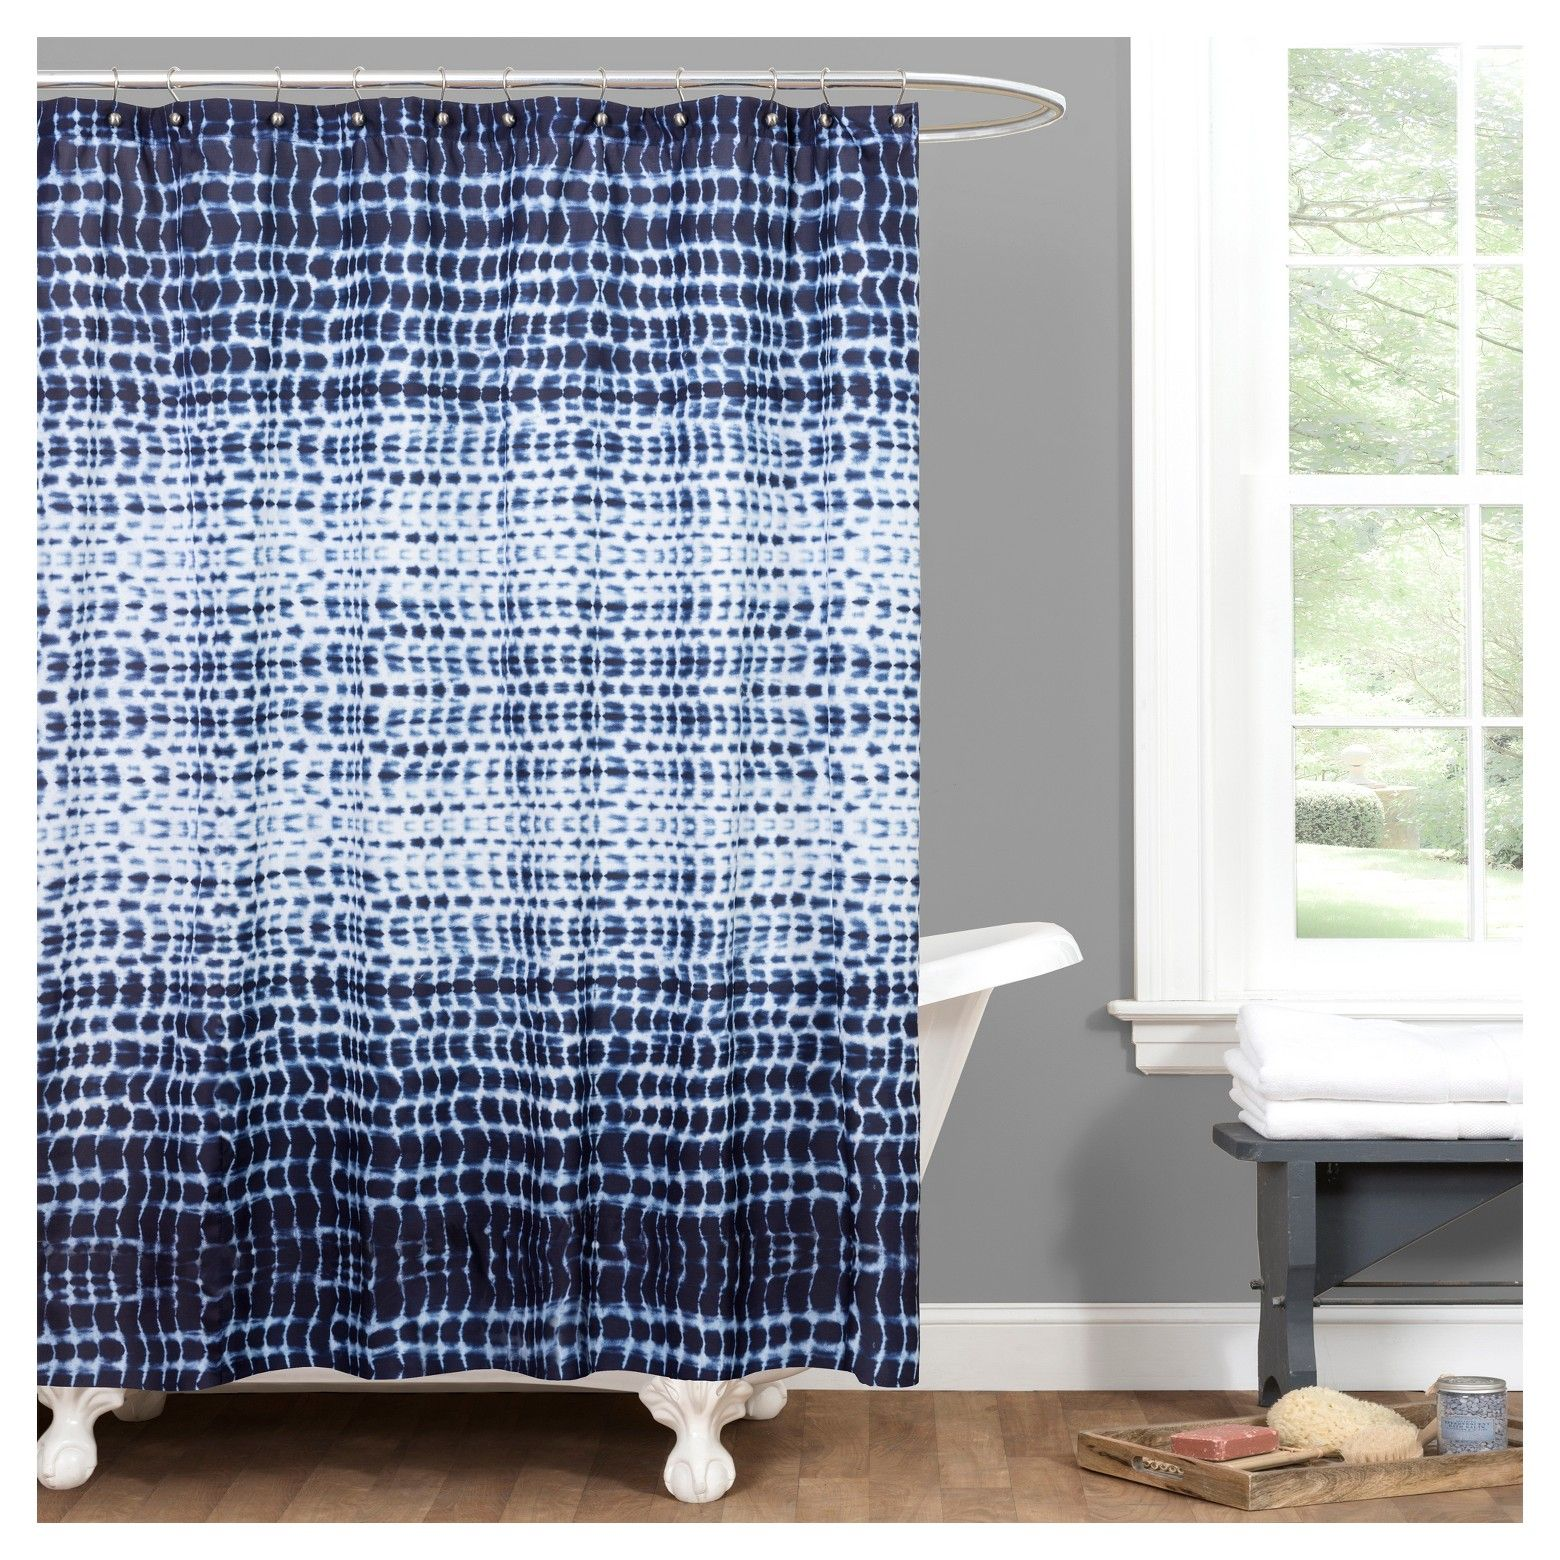 The Arney Tye Dye Shower Curtain Features A Vibrant Tie Dye Design